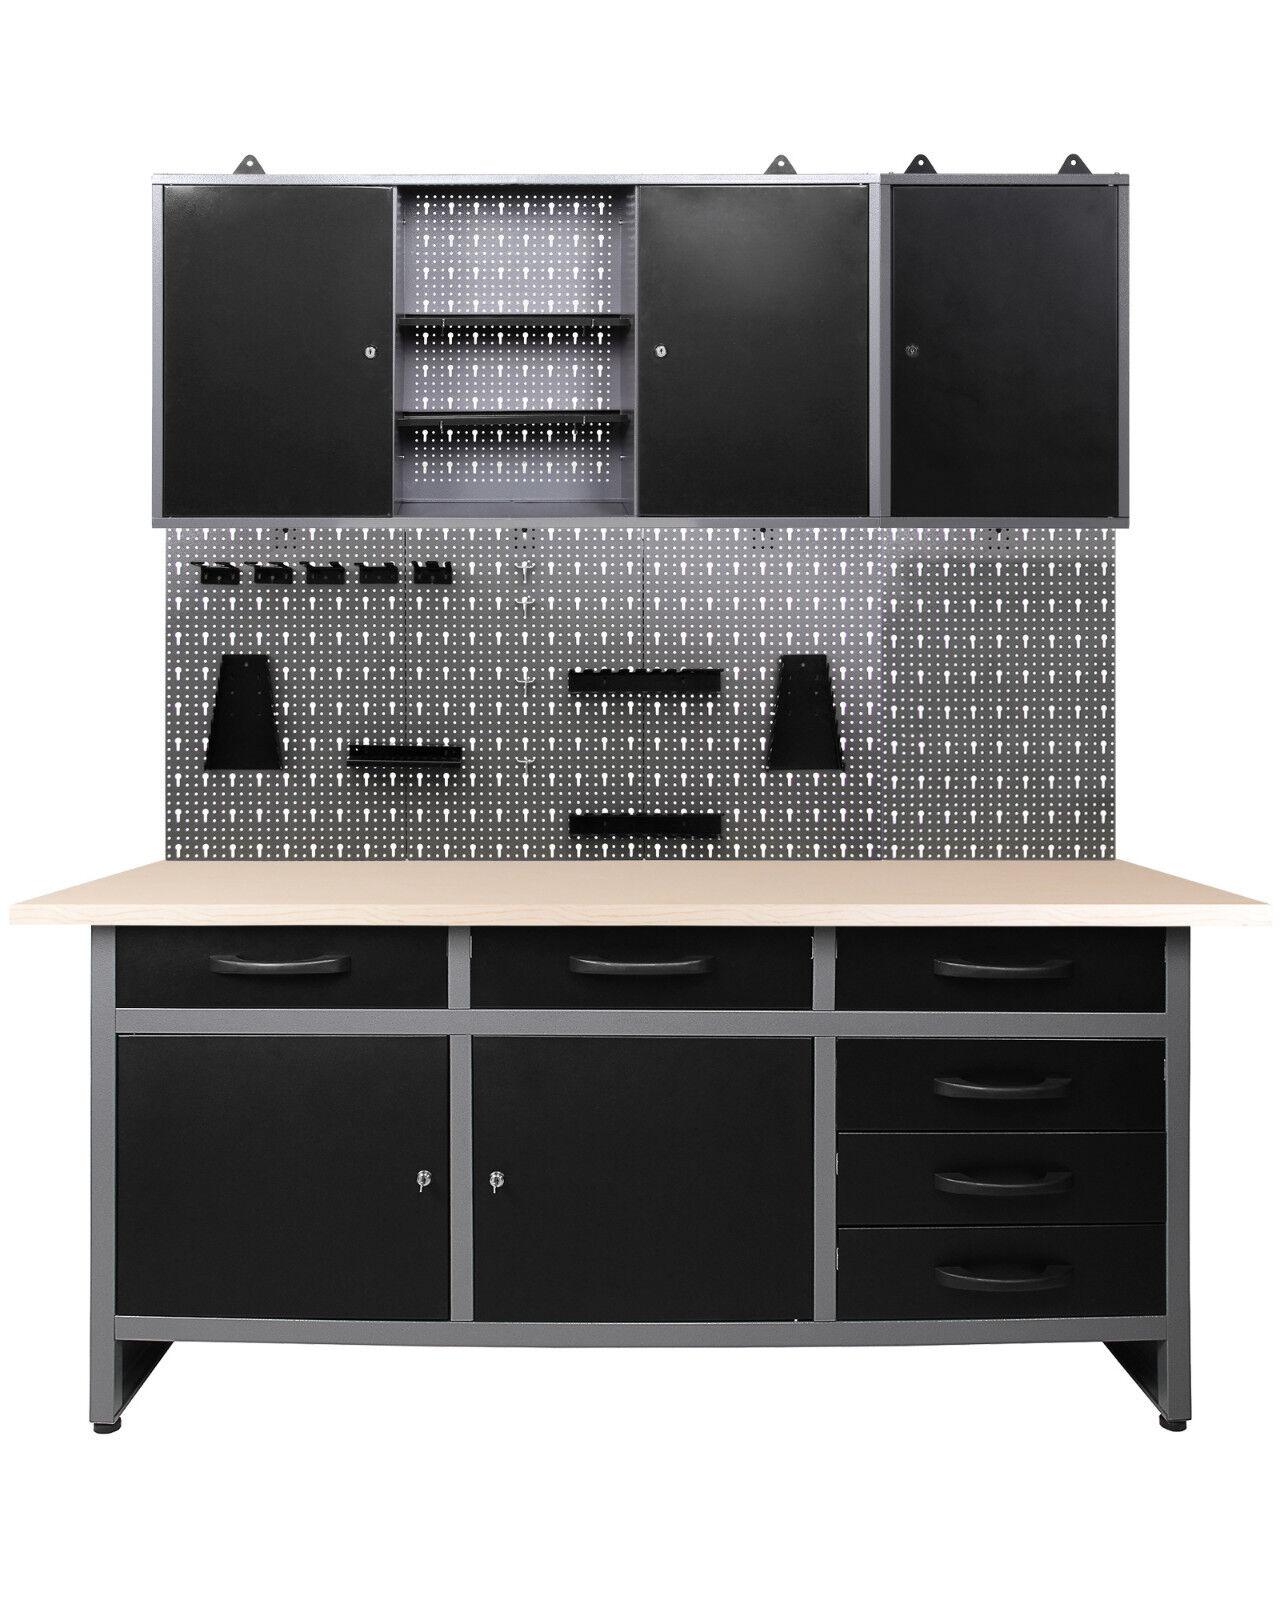 Ondis24 Werkbank 170 cm Werktisch Montagewerkbank Werkstatt Metall+Sistemo 2 Set